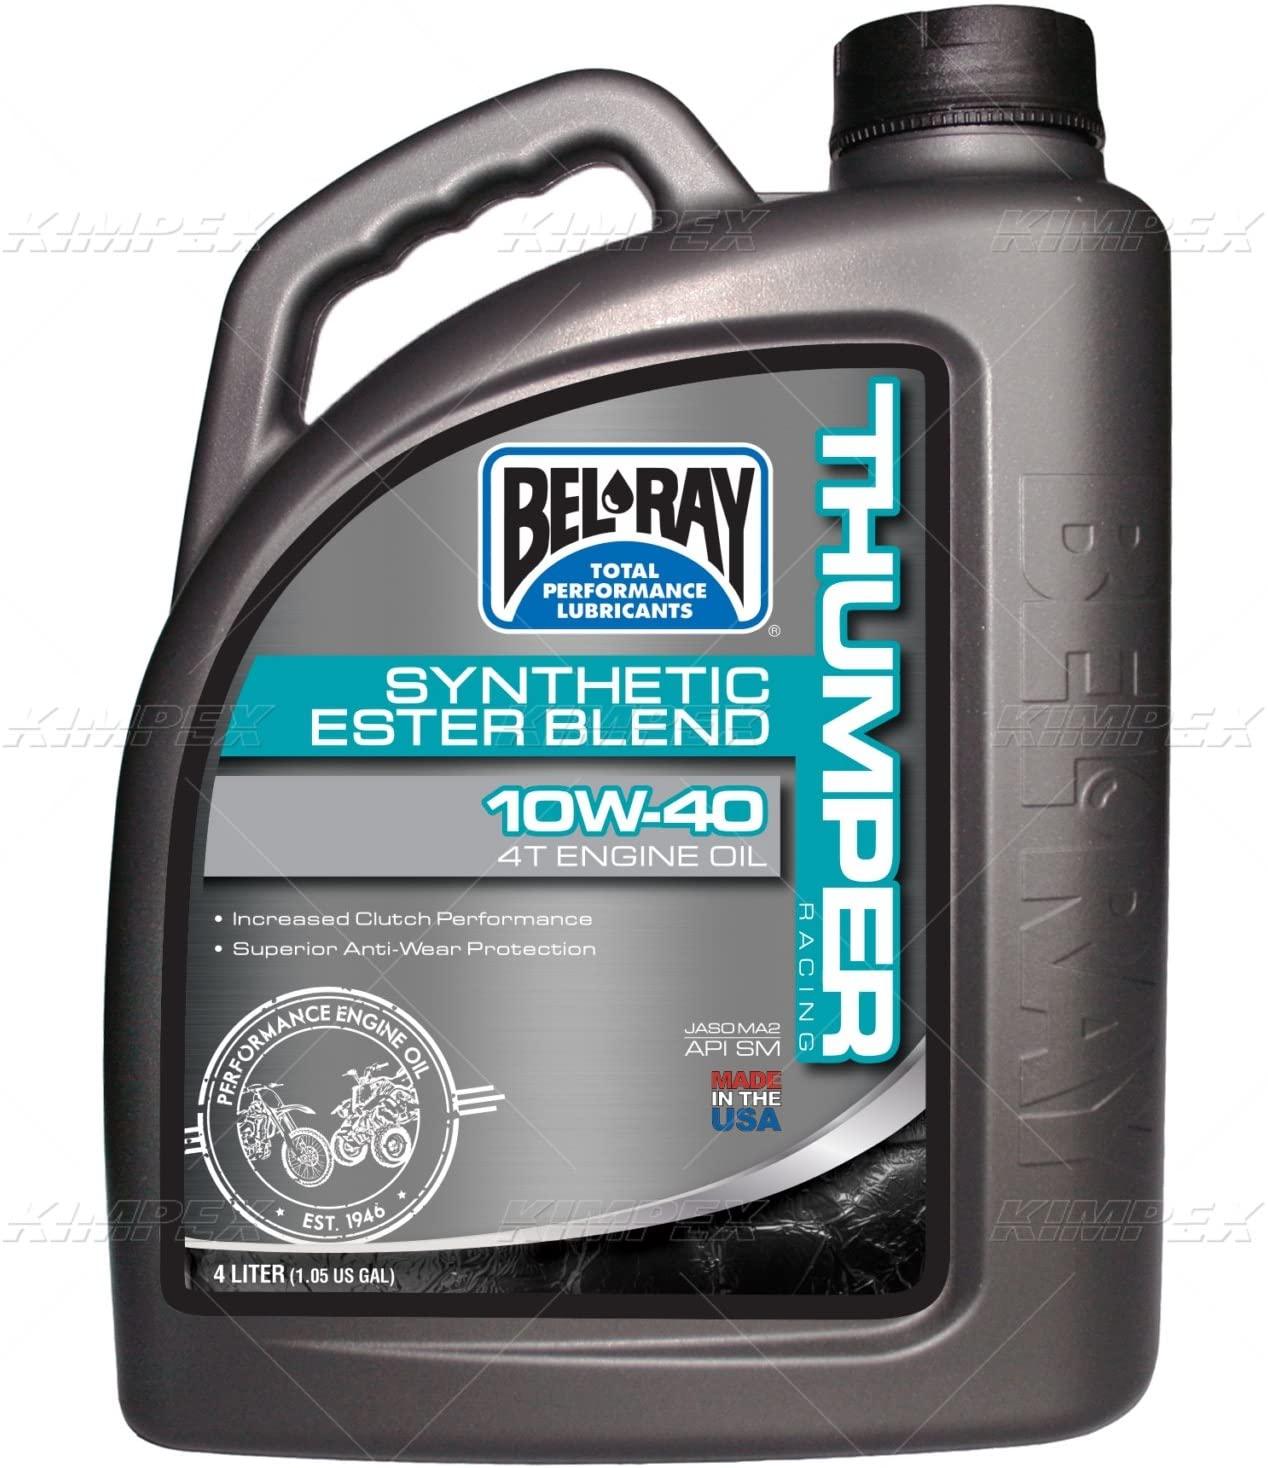 Bel-ray 99520-b4lw thumper synthetic ester blend 4t engine oil 10w-40 4-liter (99520-B4LW)